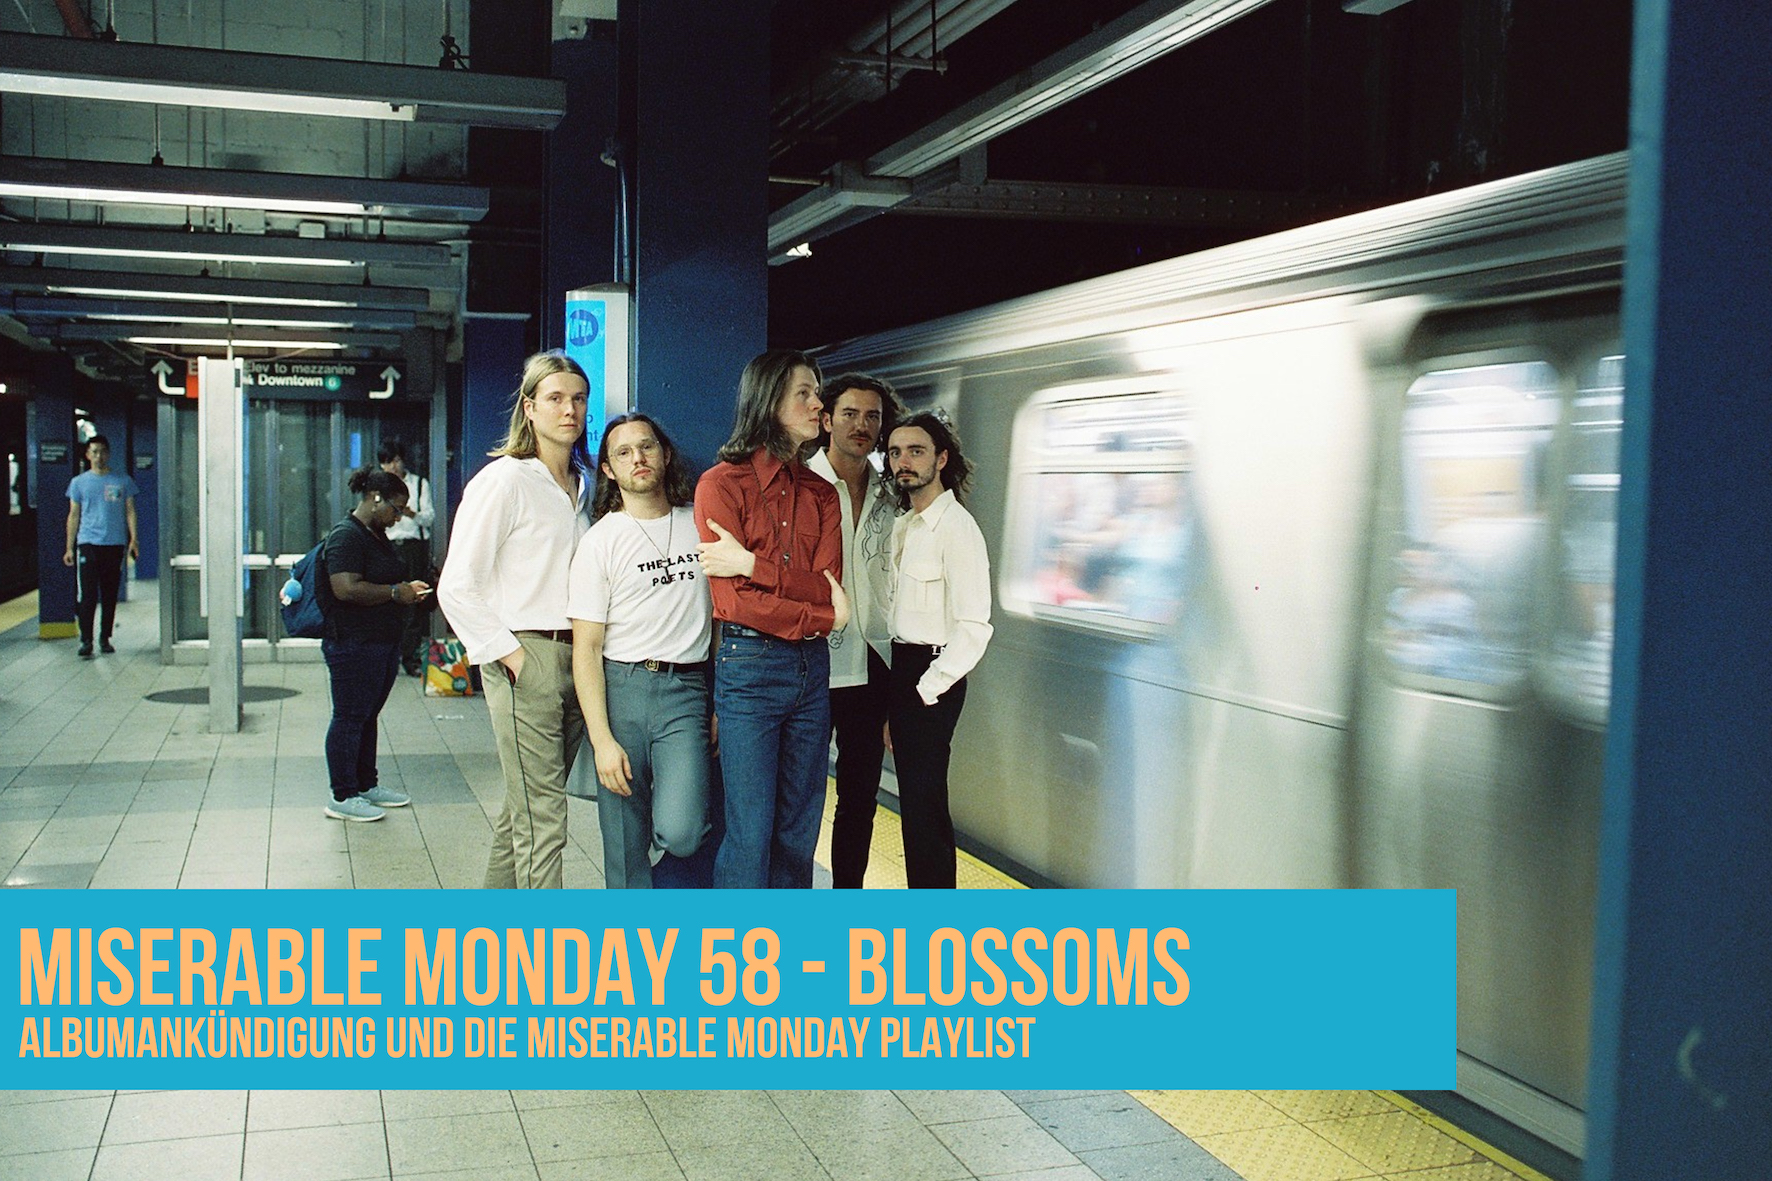 58 - Blossoms